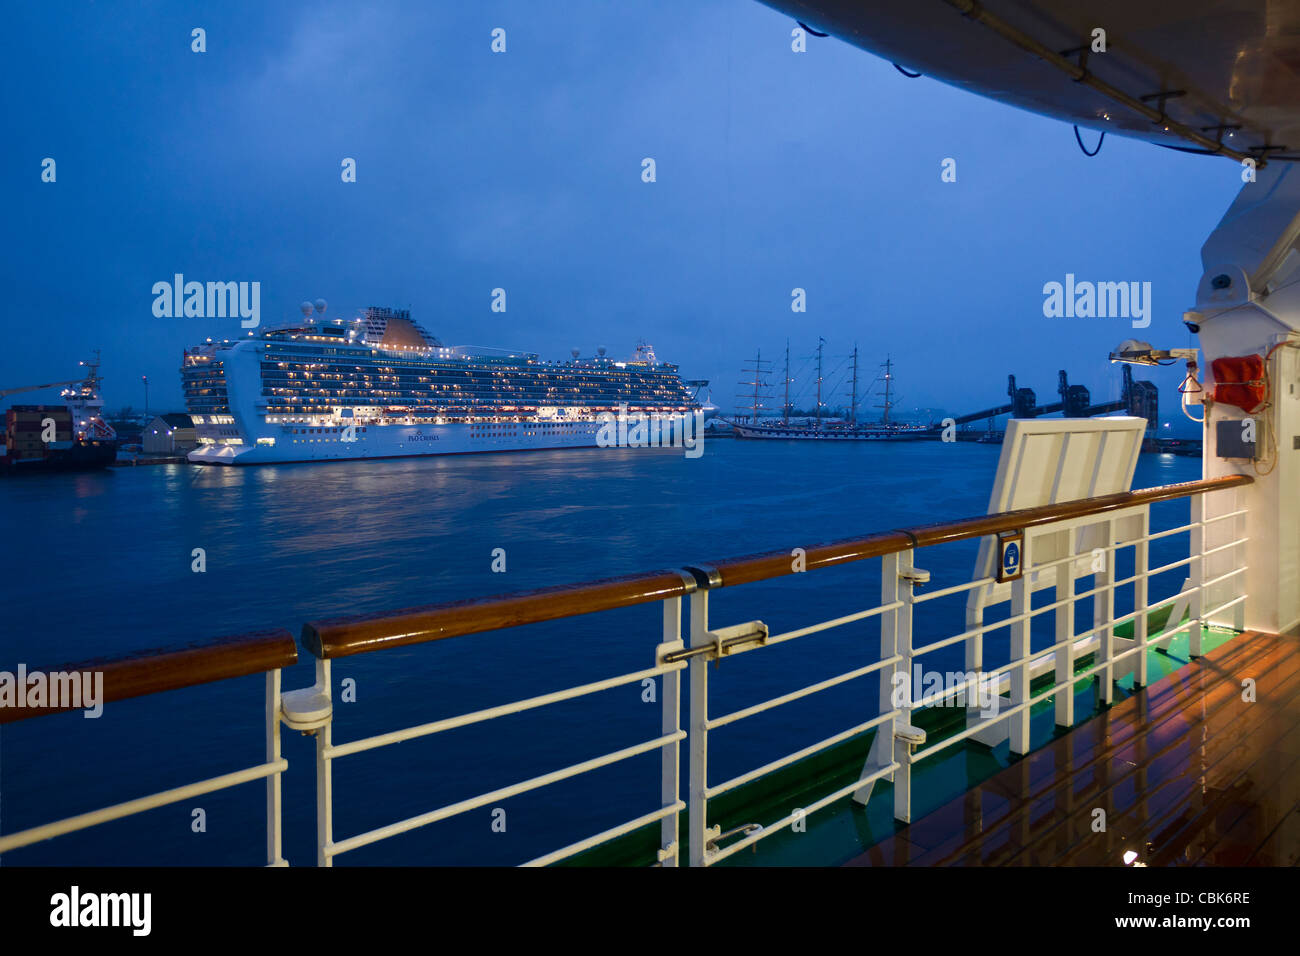 Cruise ships P&O Azura Arcadia and Star Clippers at Dusk - Stock Image